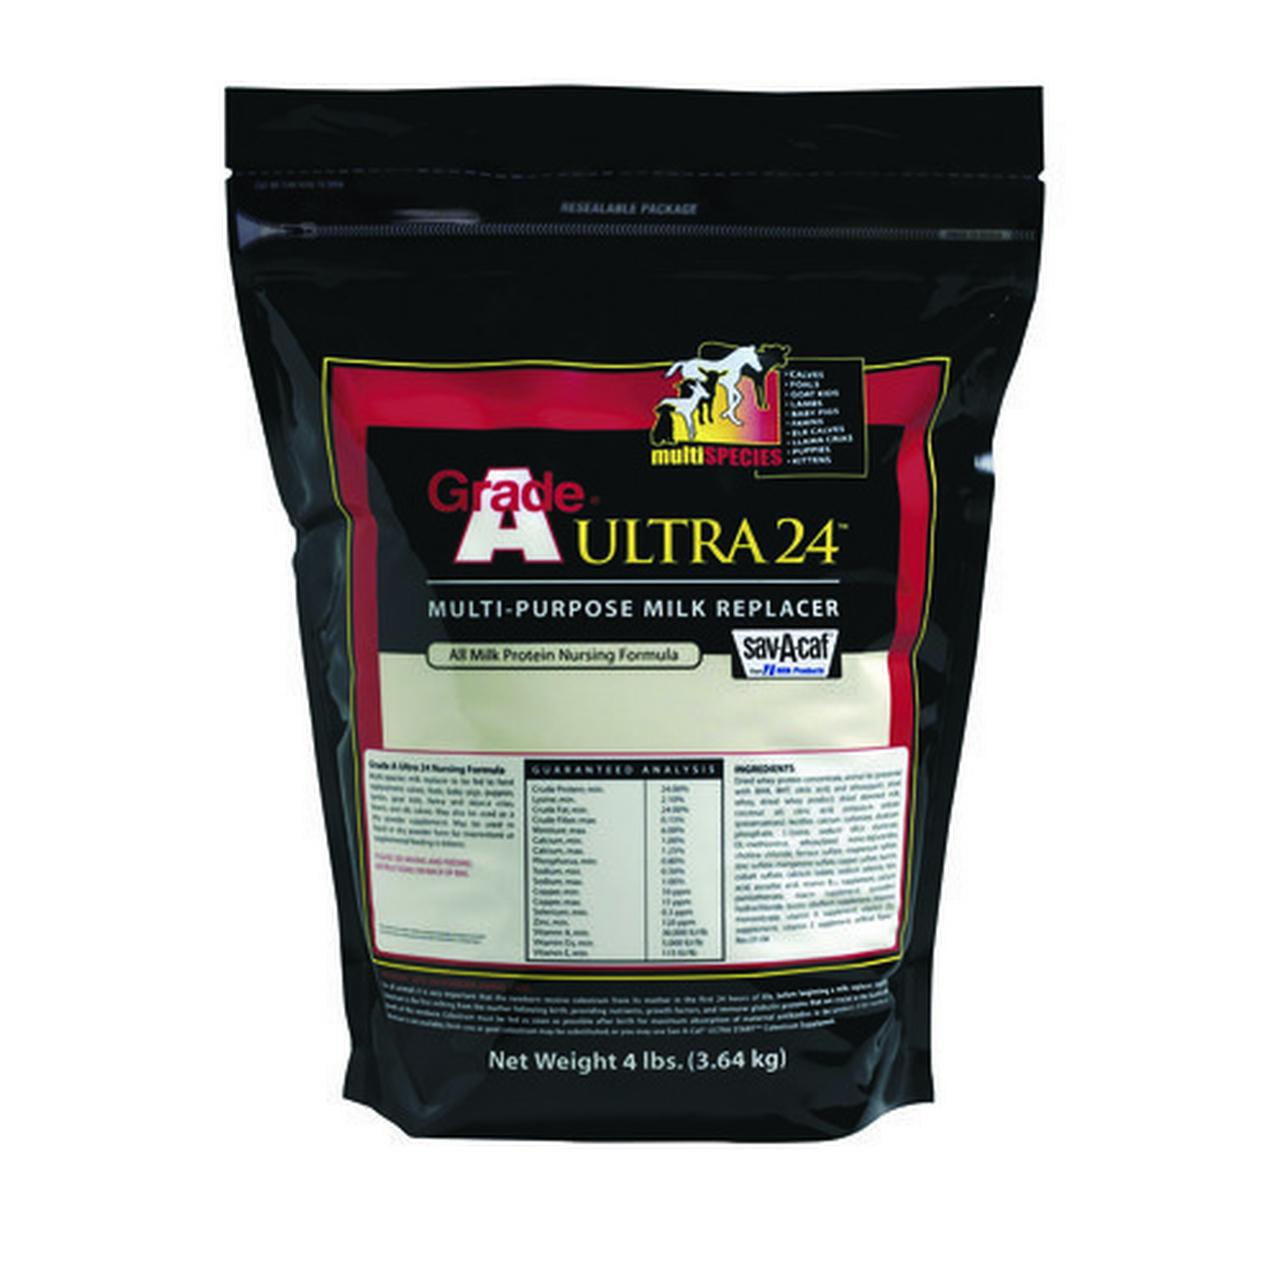 MILK PRODUCTS LLC Livestock Milk Replacer, Ultra 24, 4-Lbs.